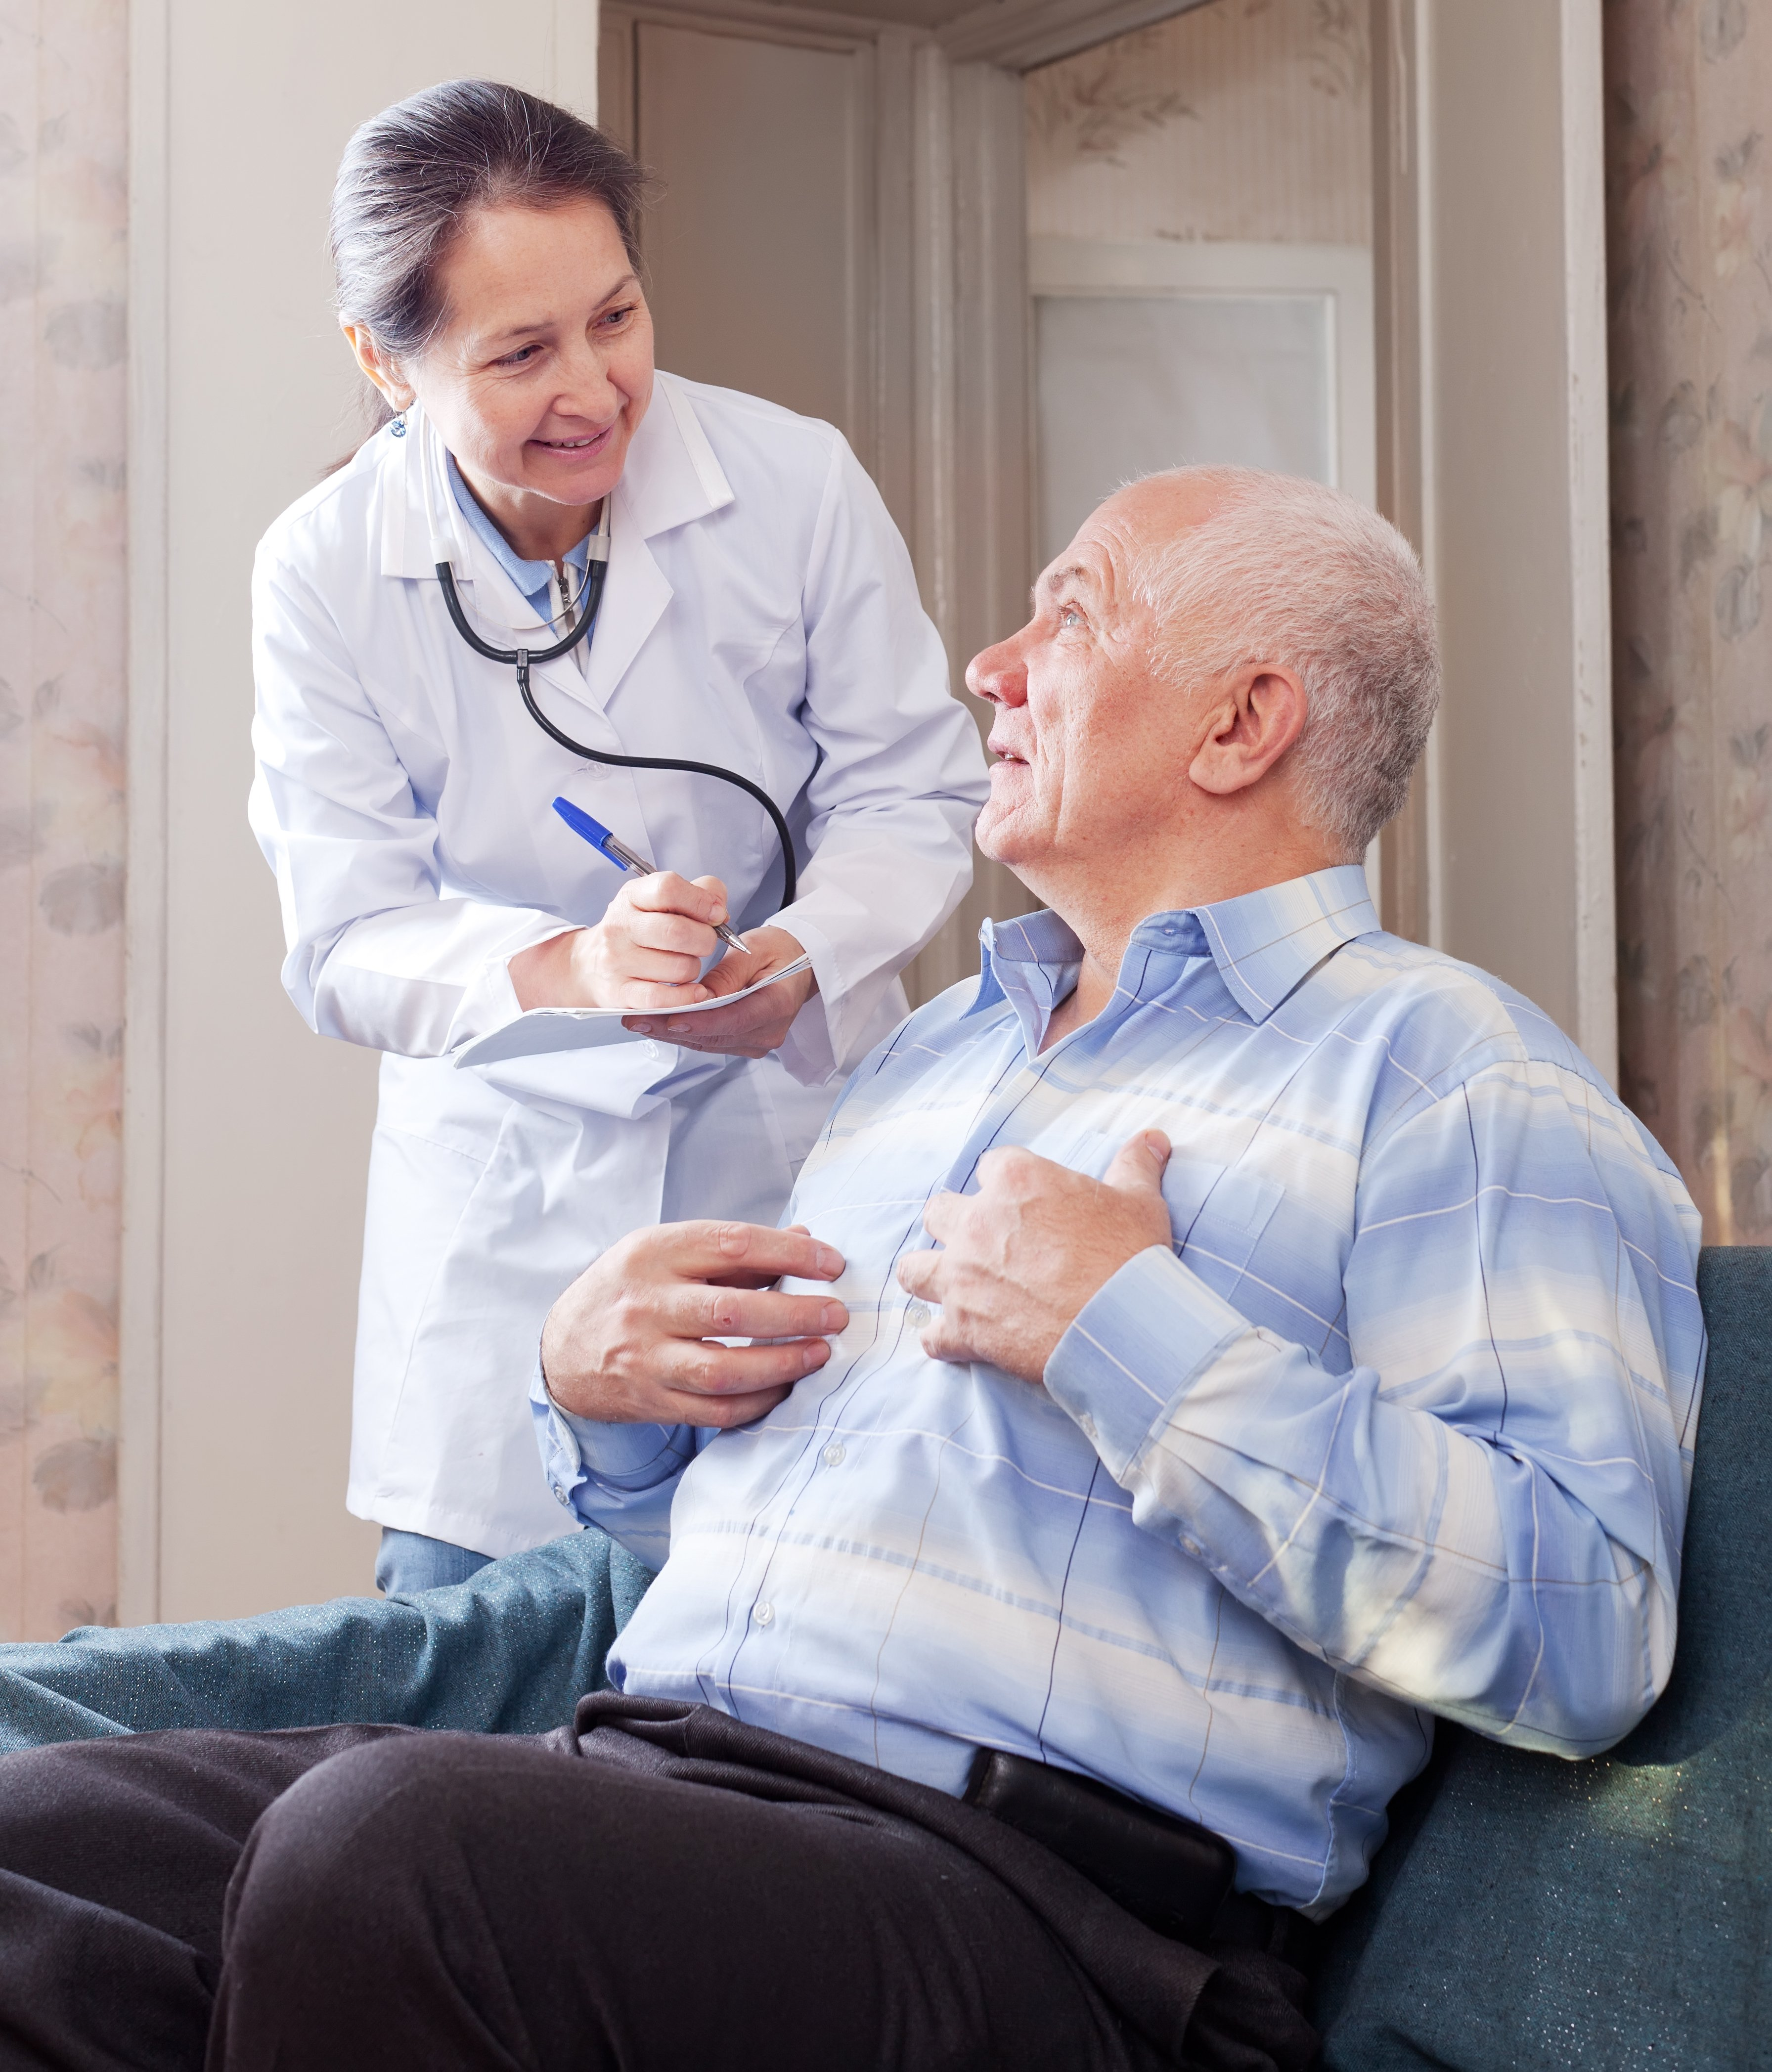 PAD treatment specialist